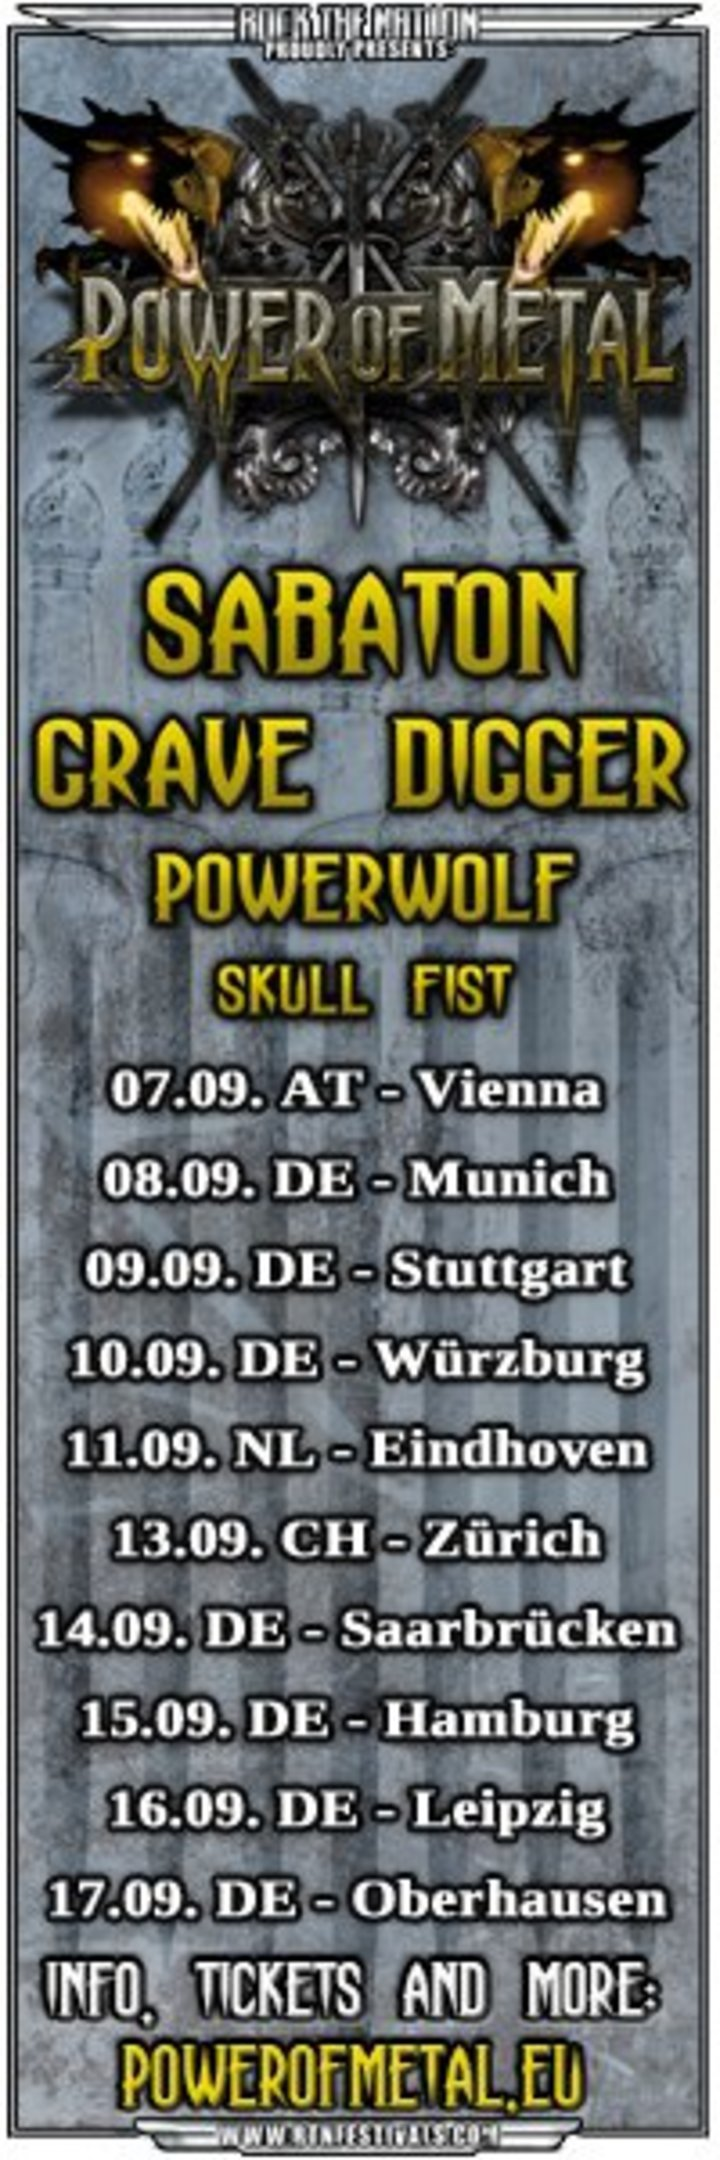 POWER OF METAL Tour Dates